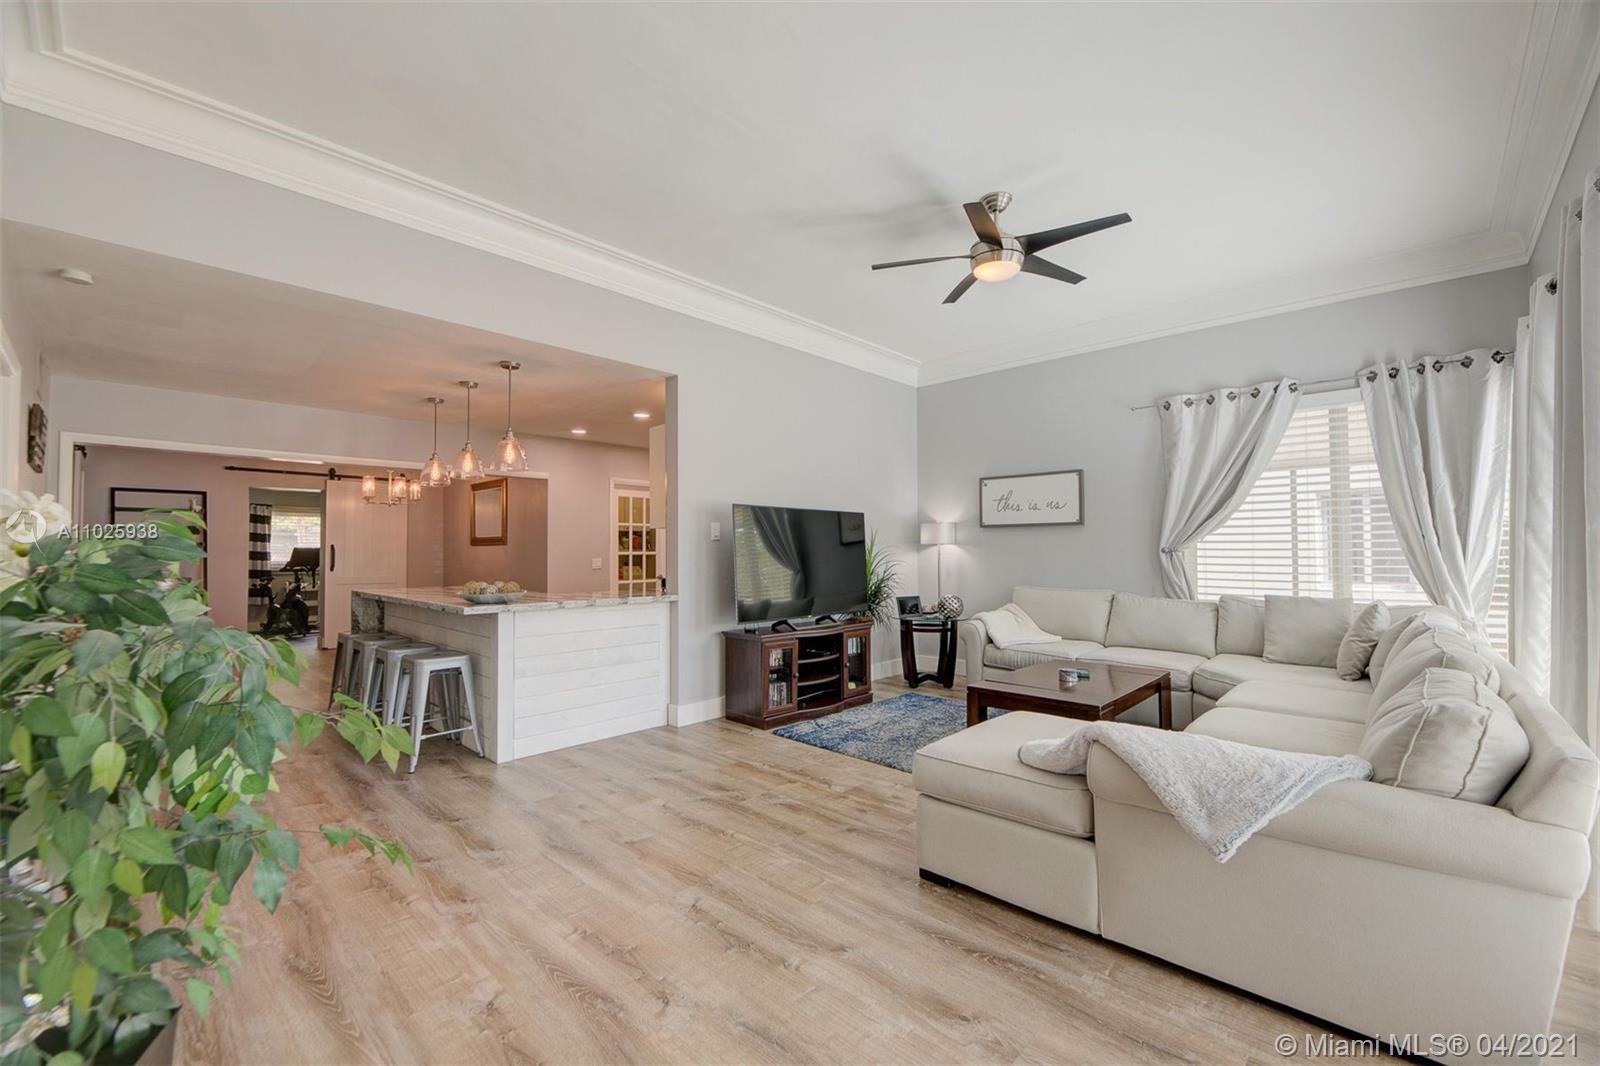 Beautifully renovated 4 bed / 3 bath single family home in Victoria Park!! Bonus detached Guest quar